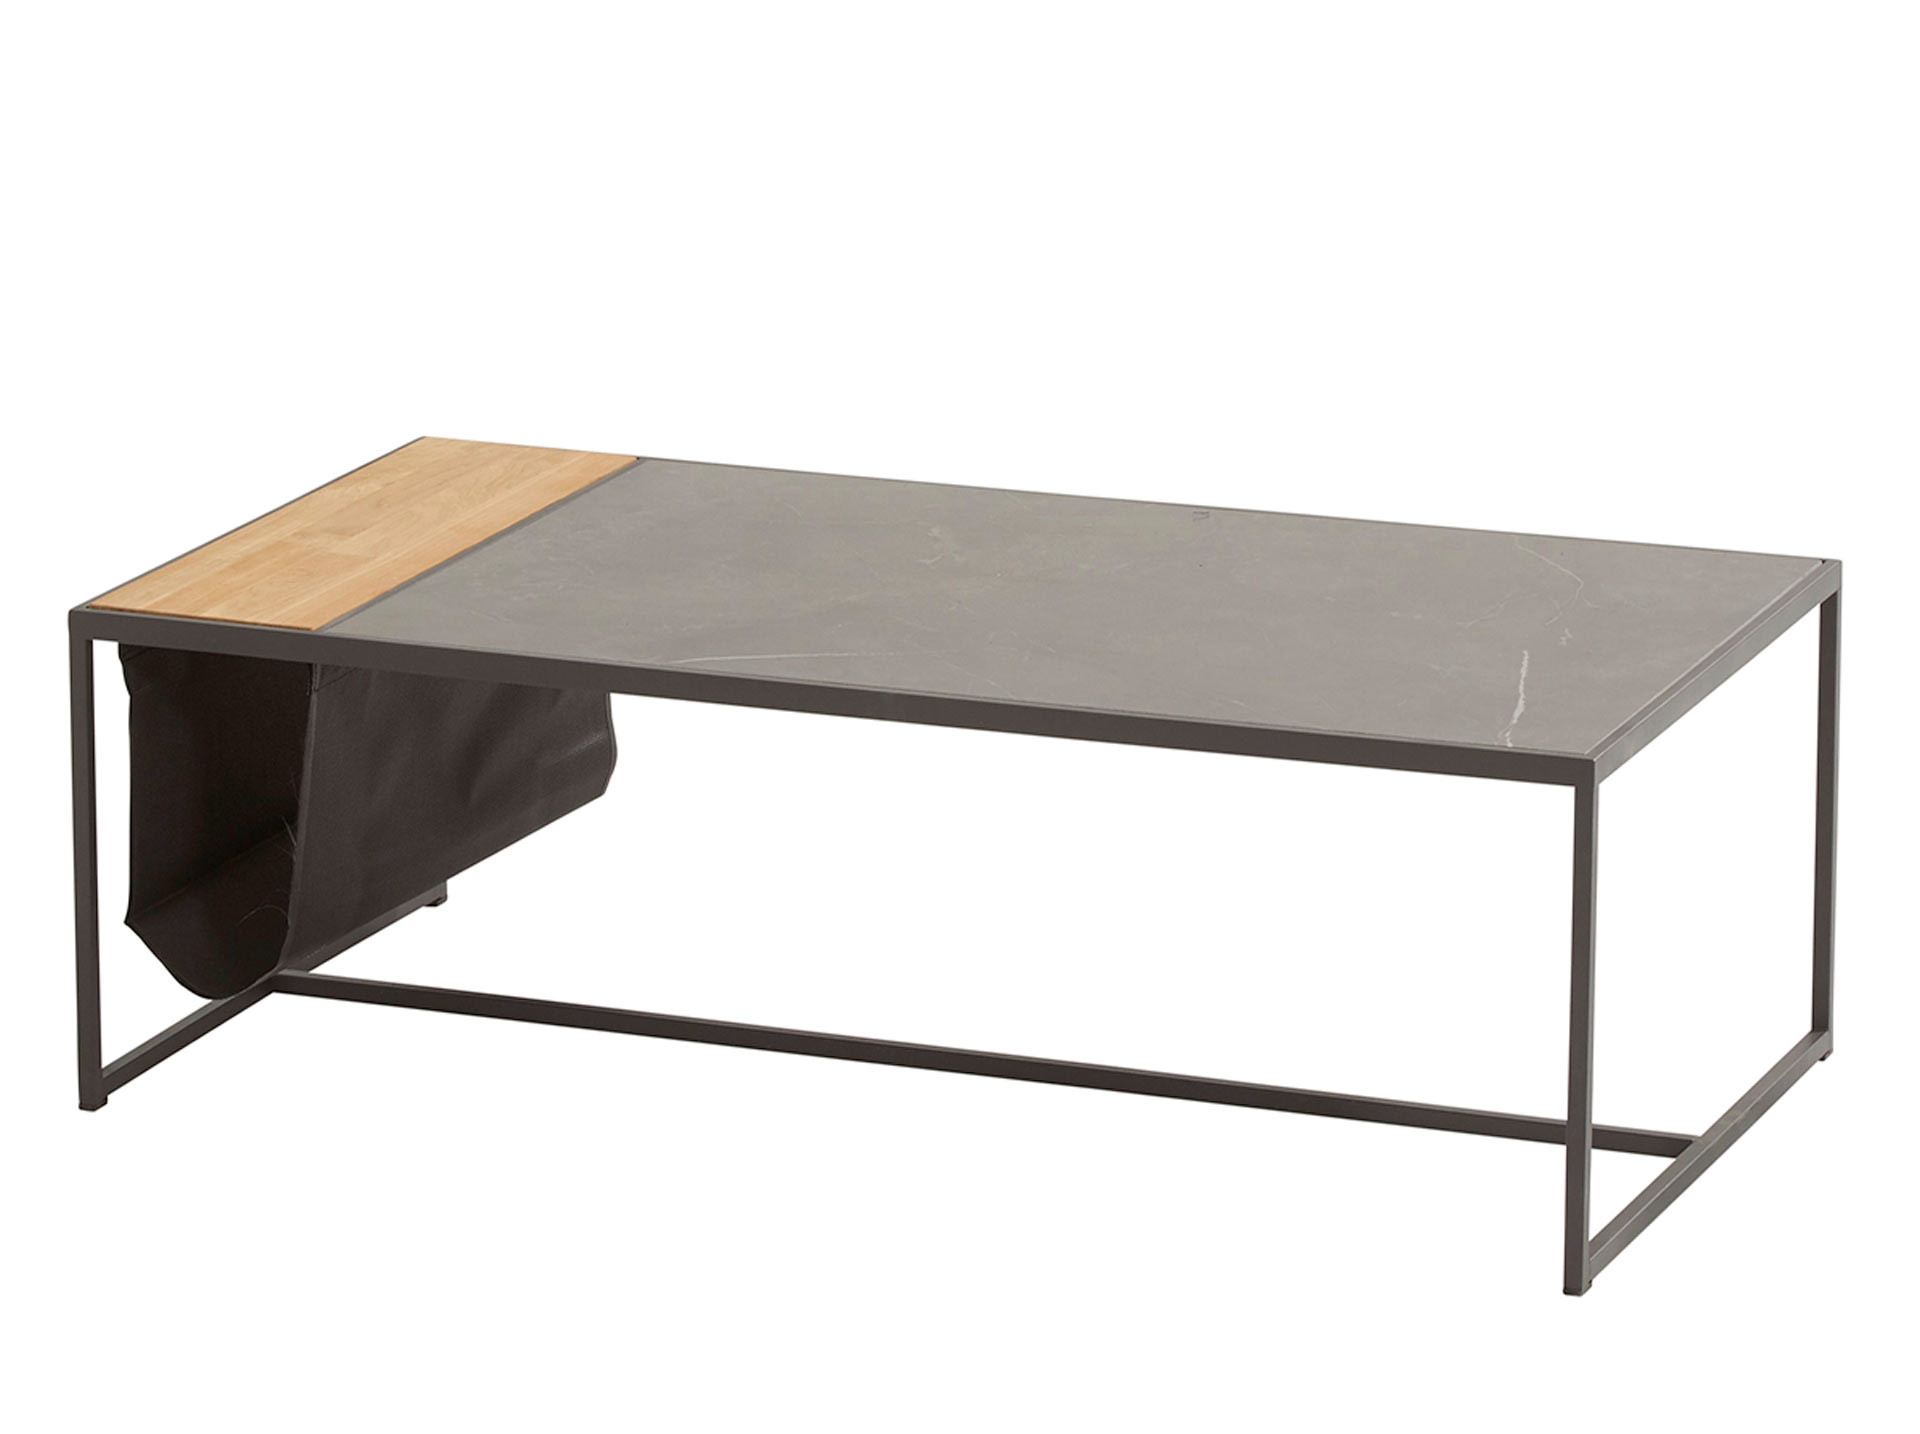 Atlas coffee table ceramic rectangular 122 x 62 x 35 cm